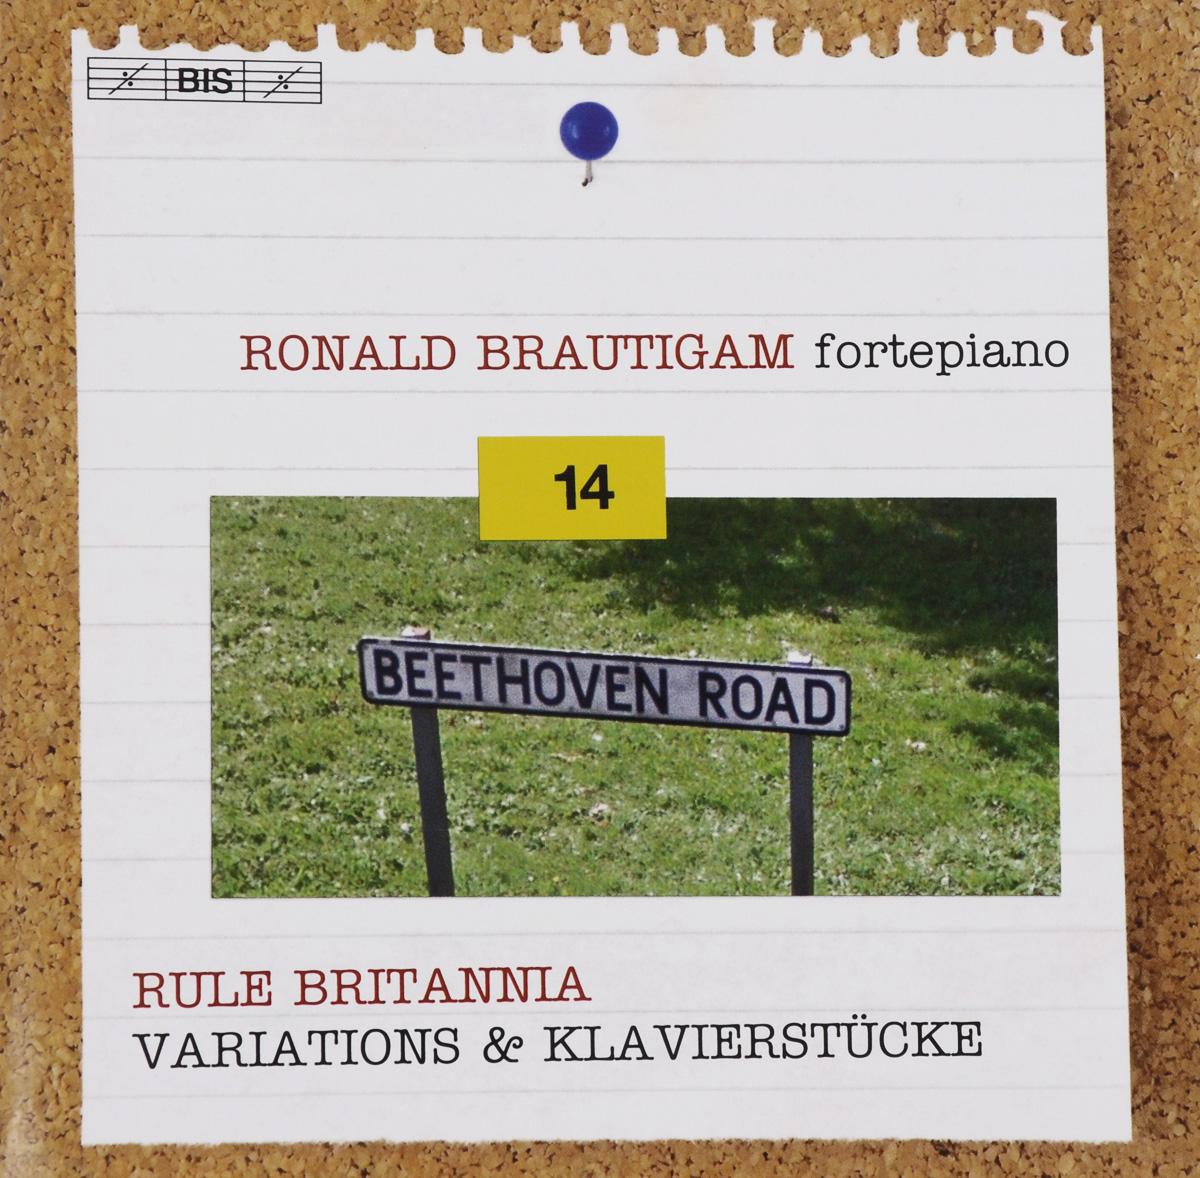 Роналд Броутайджем Ronald Brautigam. Beethoven. Complete Works For Solo Piano Volume 14. Rule Britannia. Variations & Klavierstucke (SACD) штефан блунир lizst tasso totentanz piano music sacd